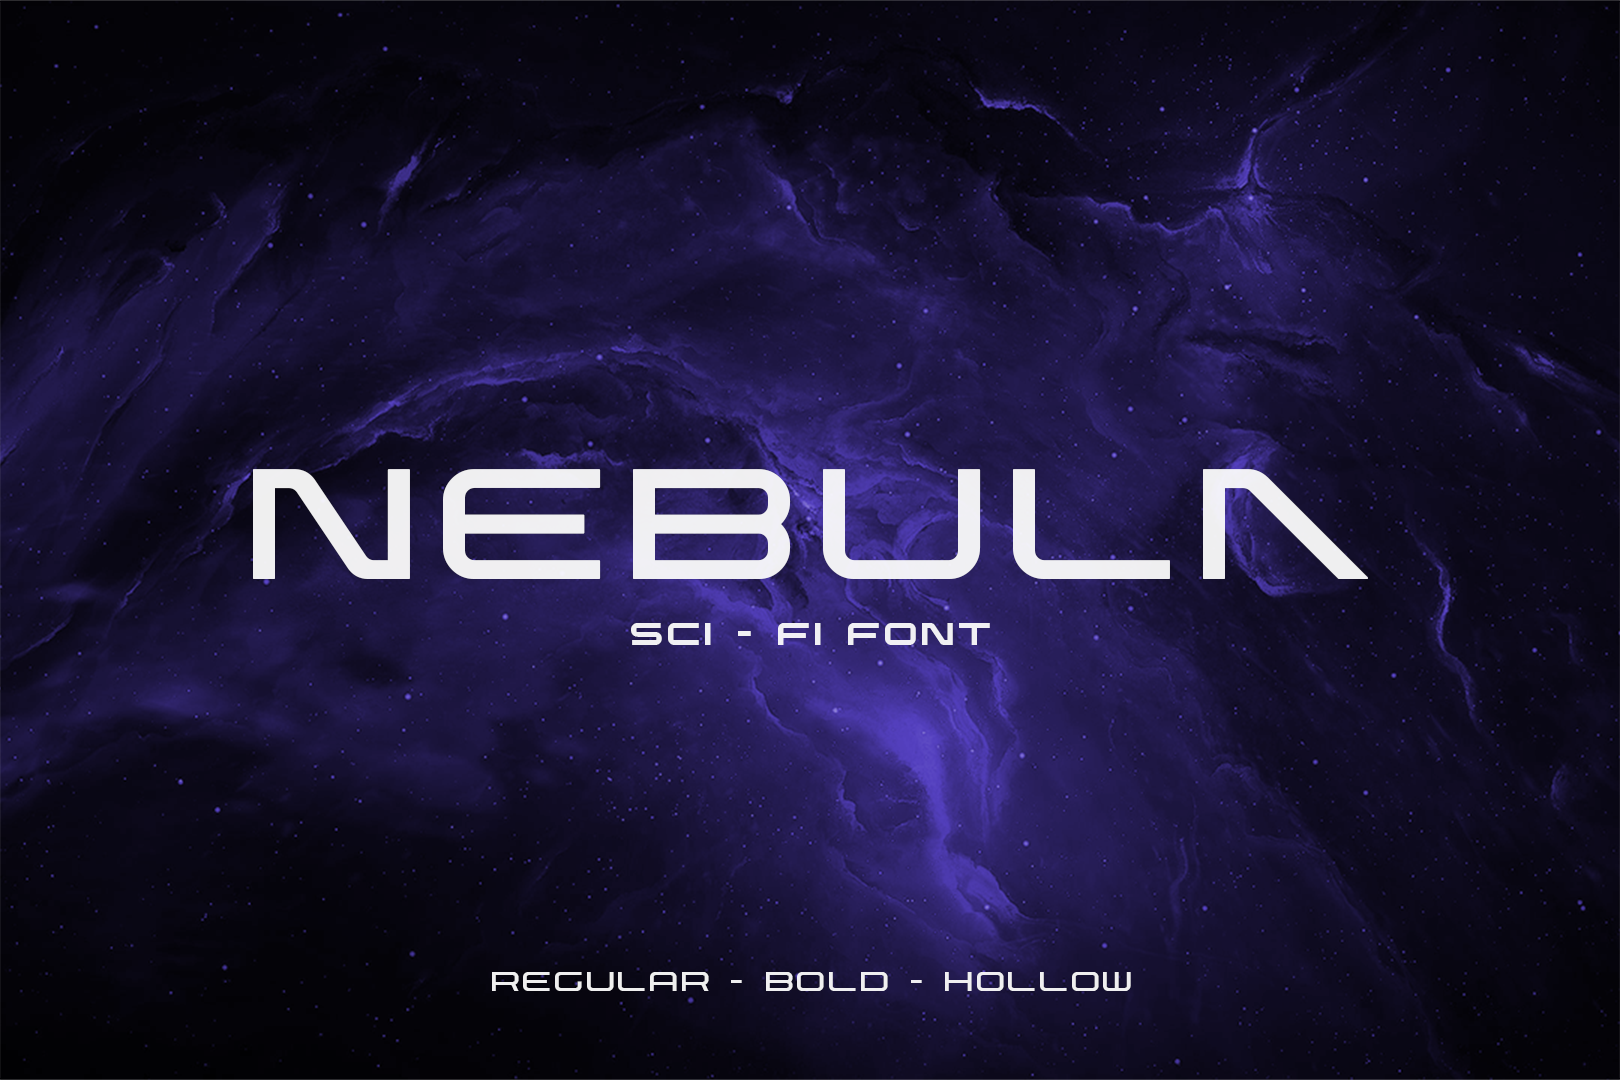 Nebula Sci Fi Font Free Display Fonts Pixelify Net